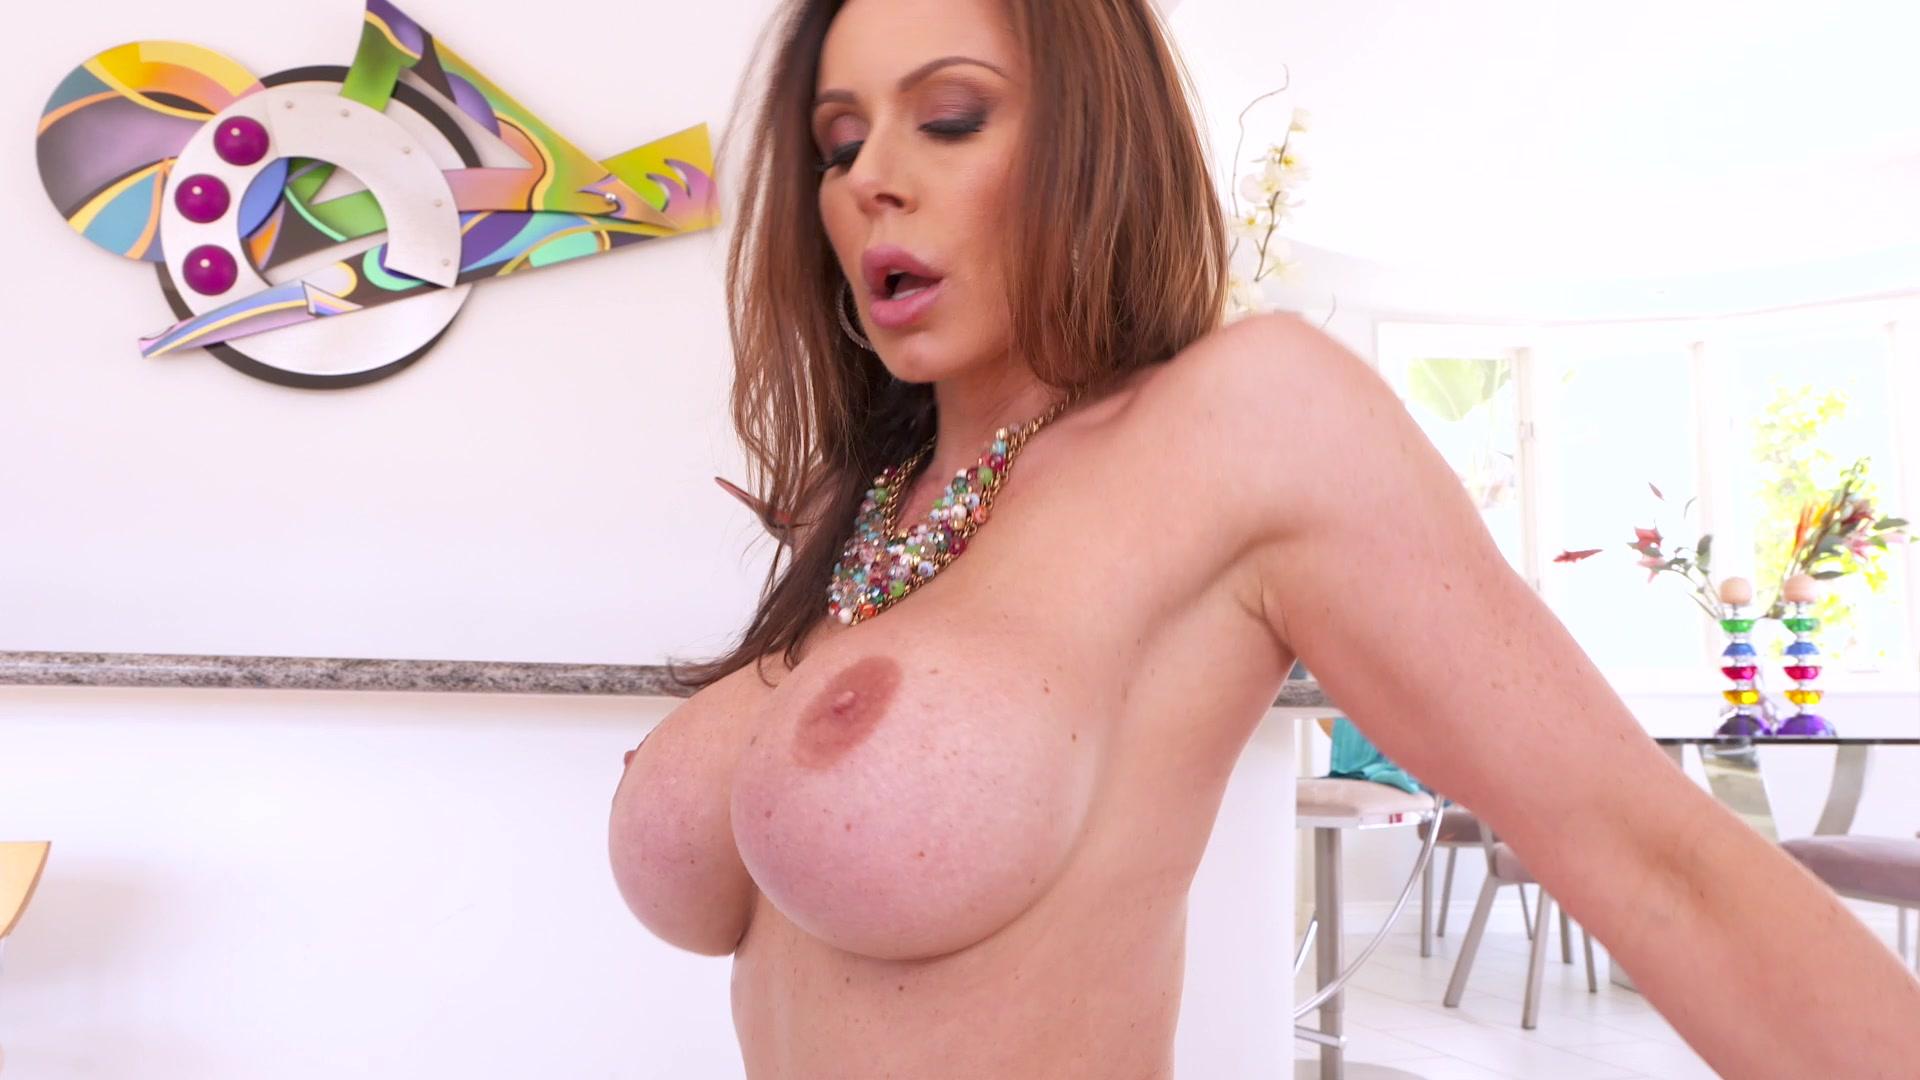 Pamela rogers turner nude pictures